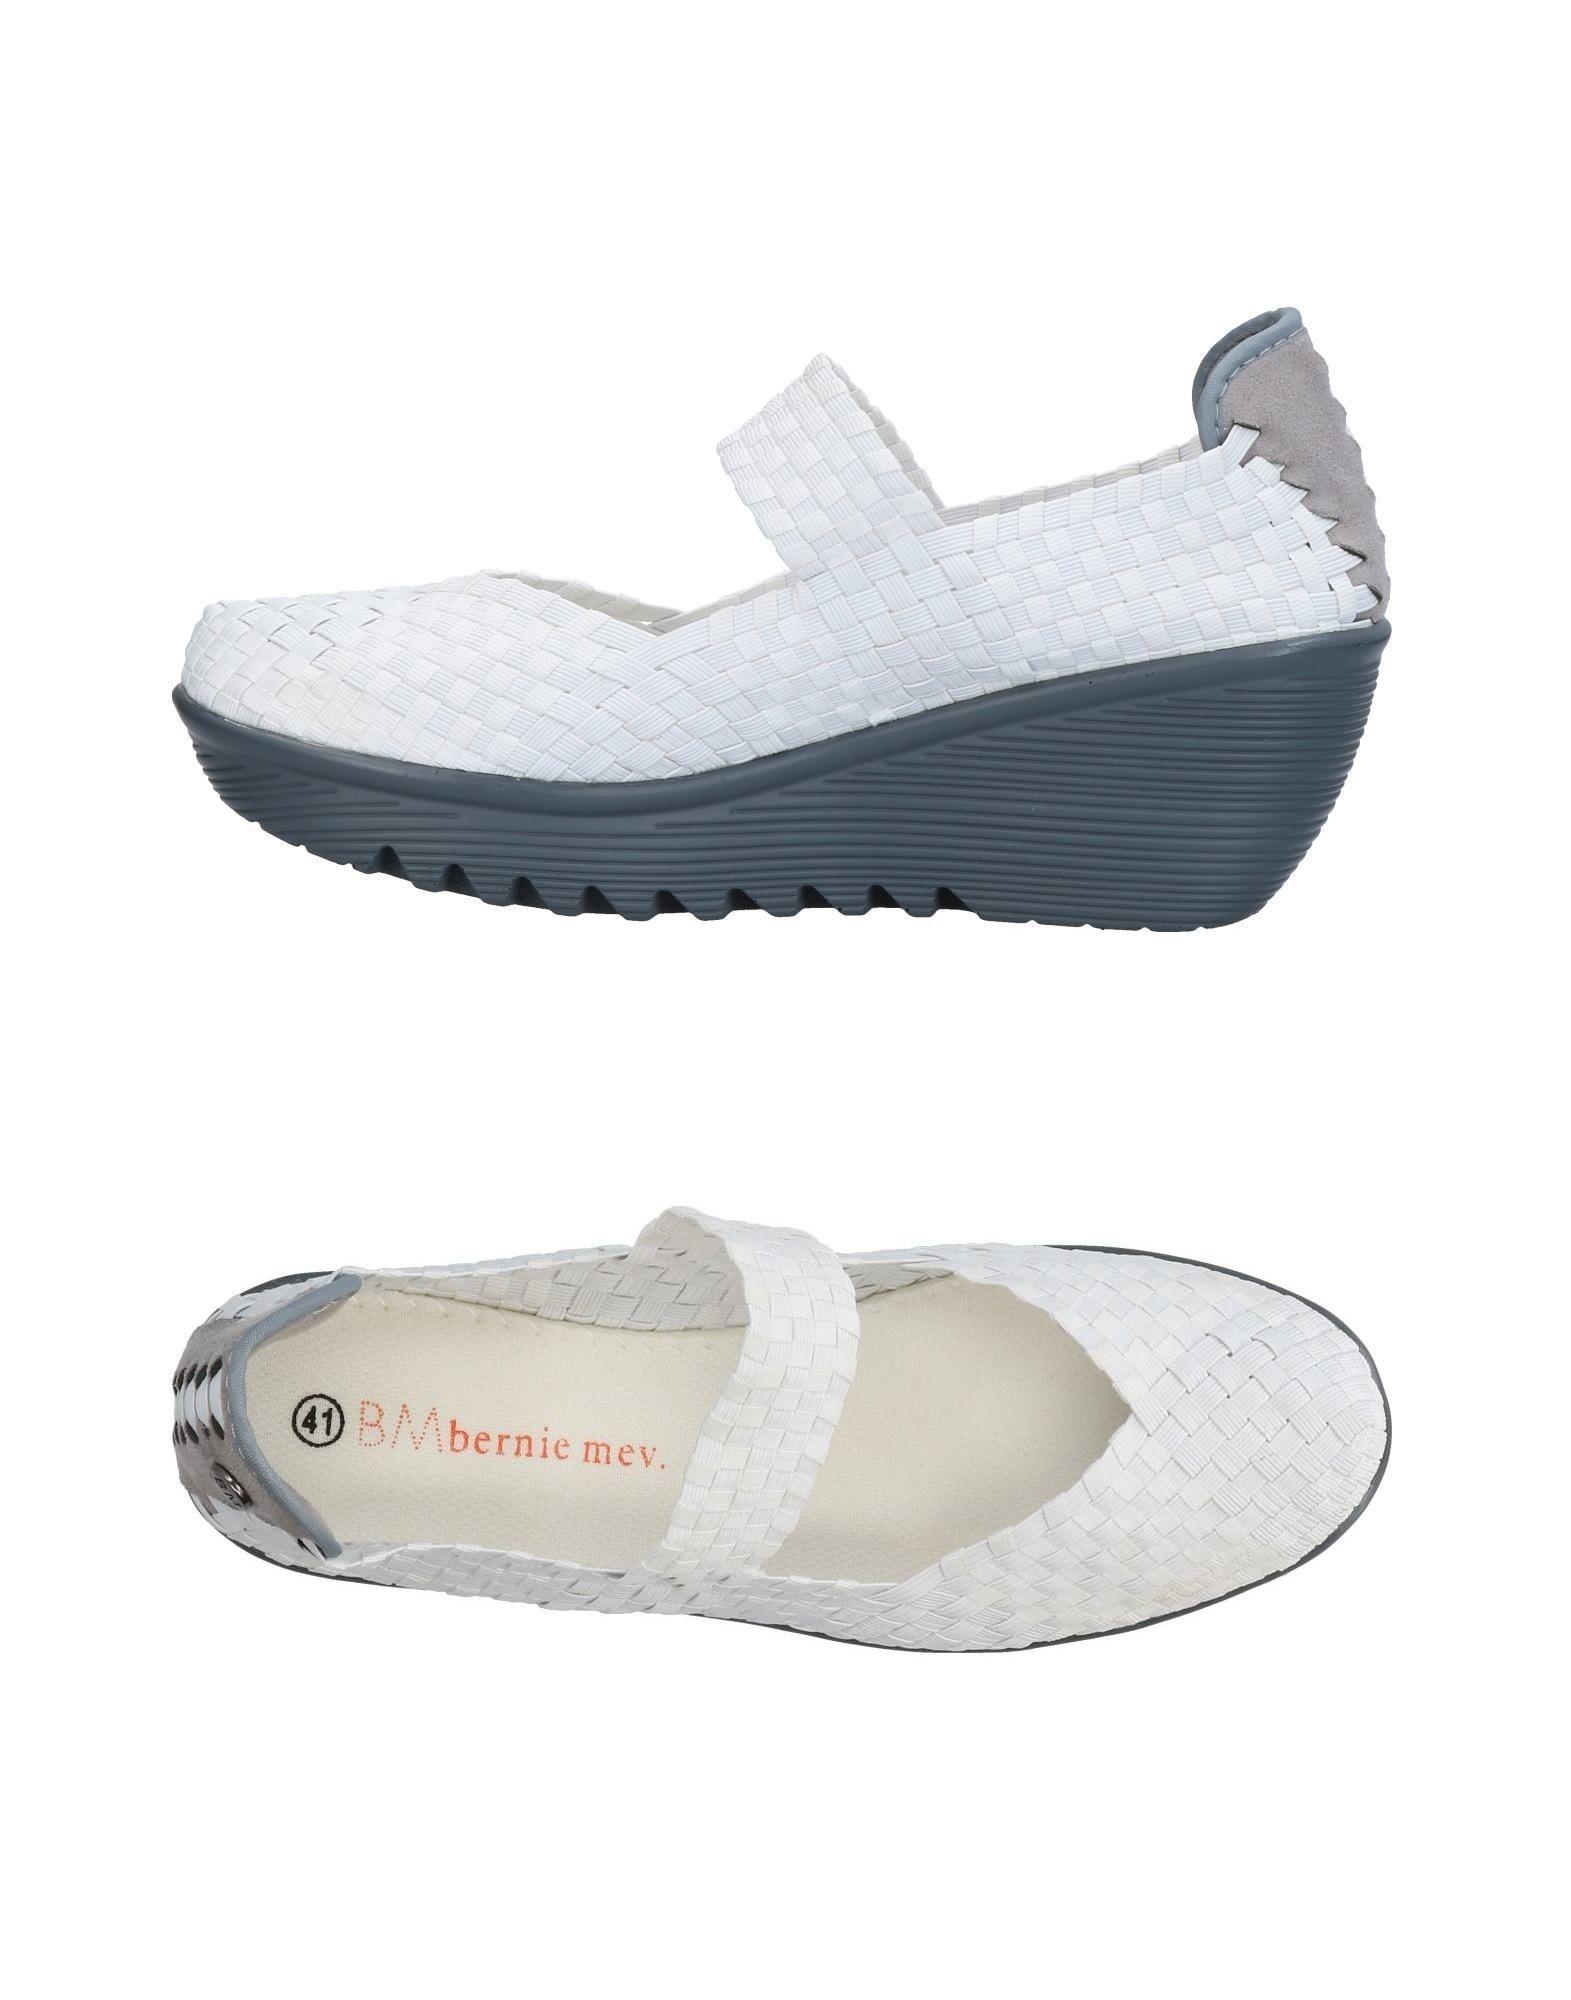 BERNIE MEV. Pumps. techno fabric, no appliqués, solid color, round toeline, unlined, rubber sole, wedge heel. Textile fibers